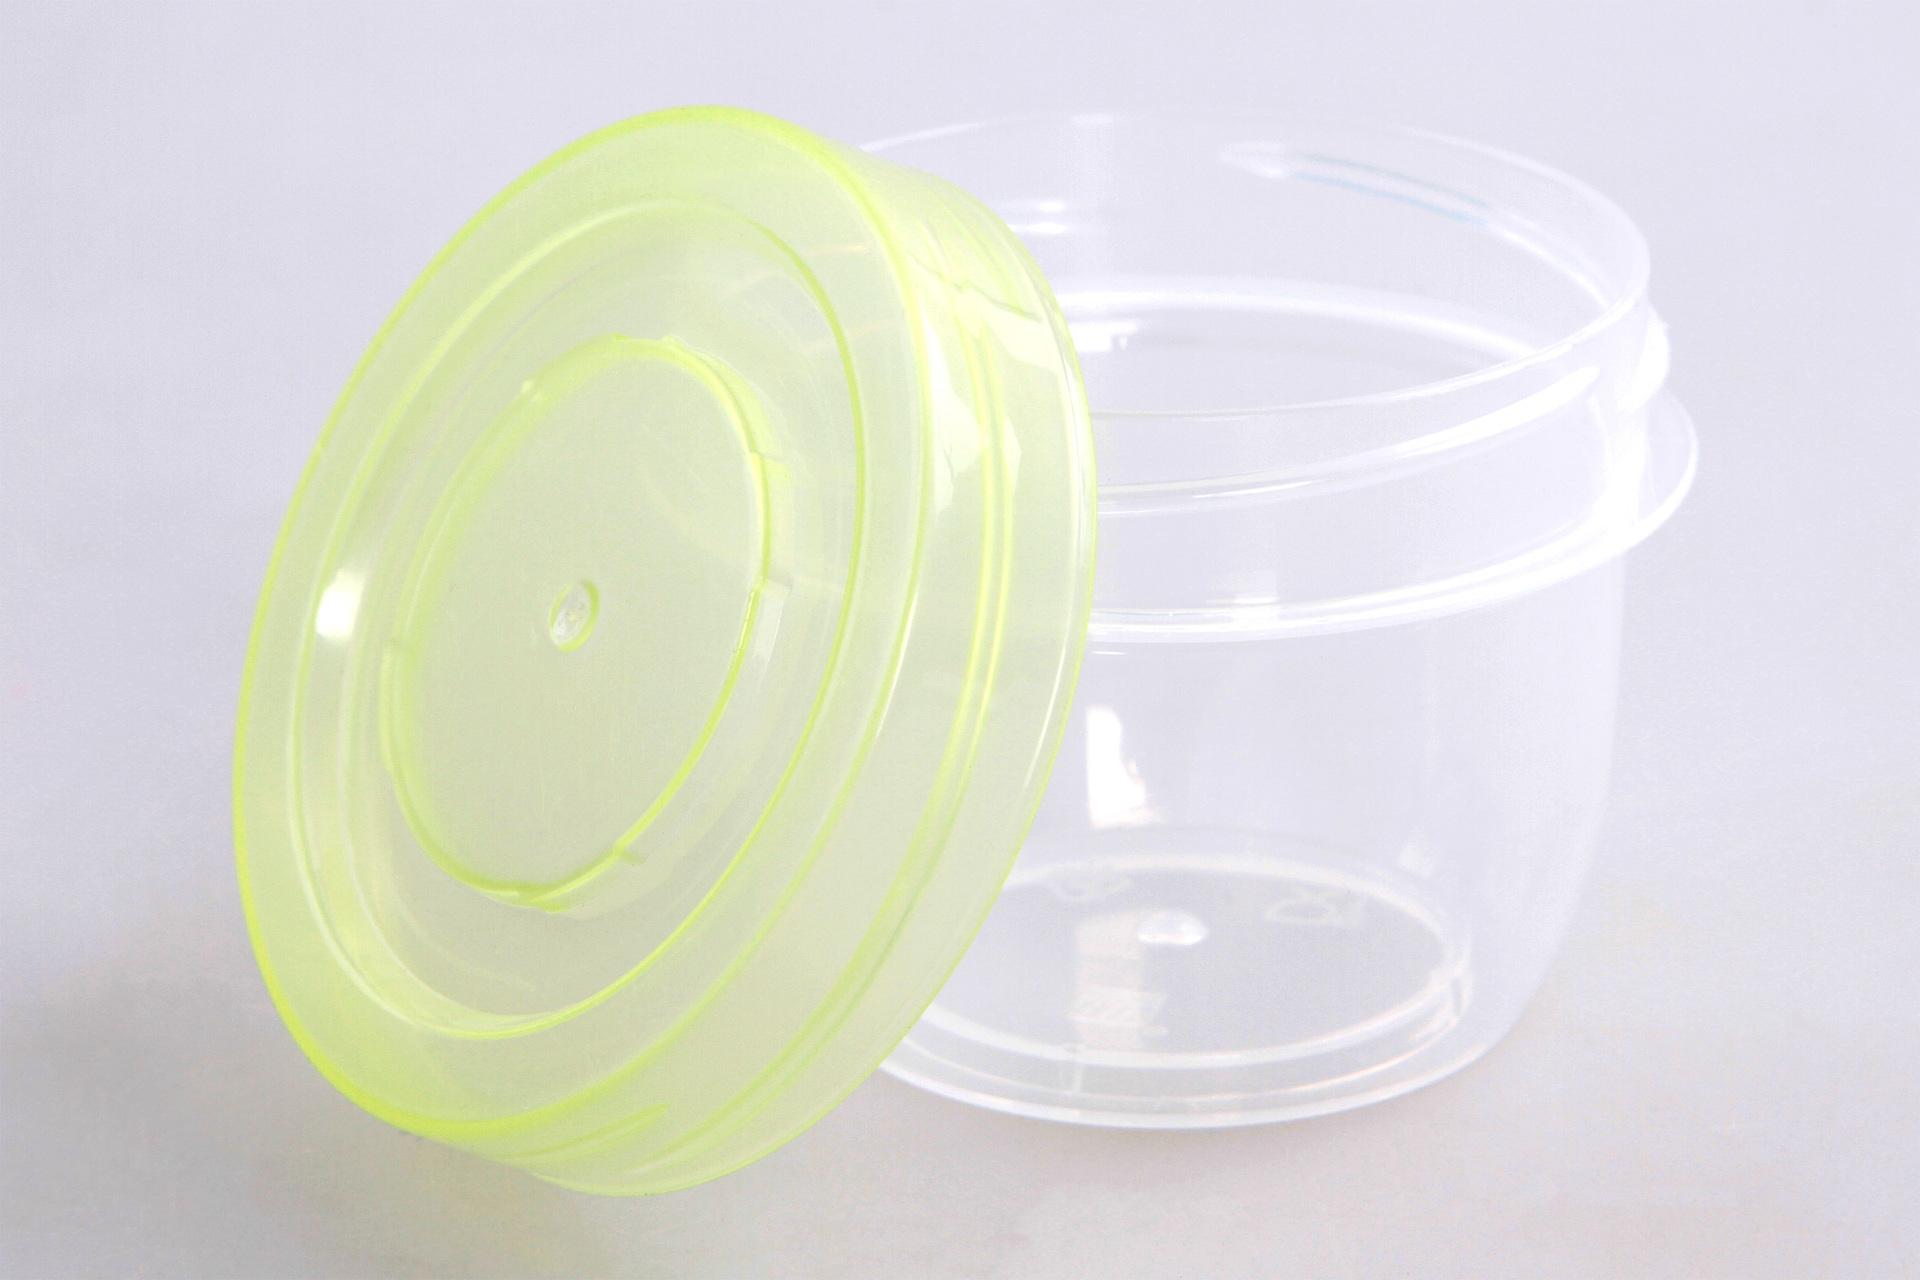 6 ks BOX 50 ml, z odolného plastu